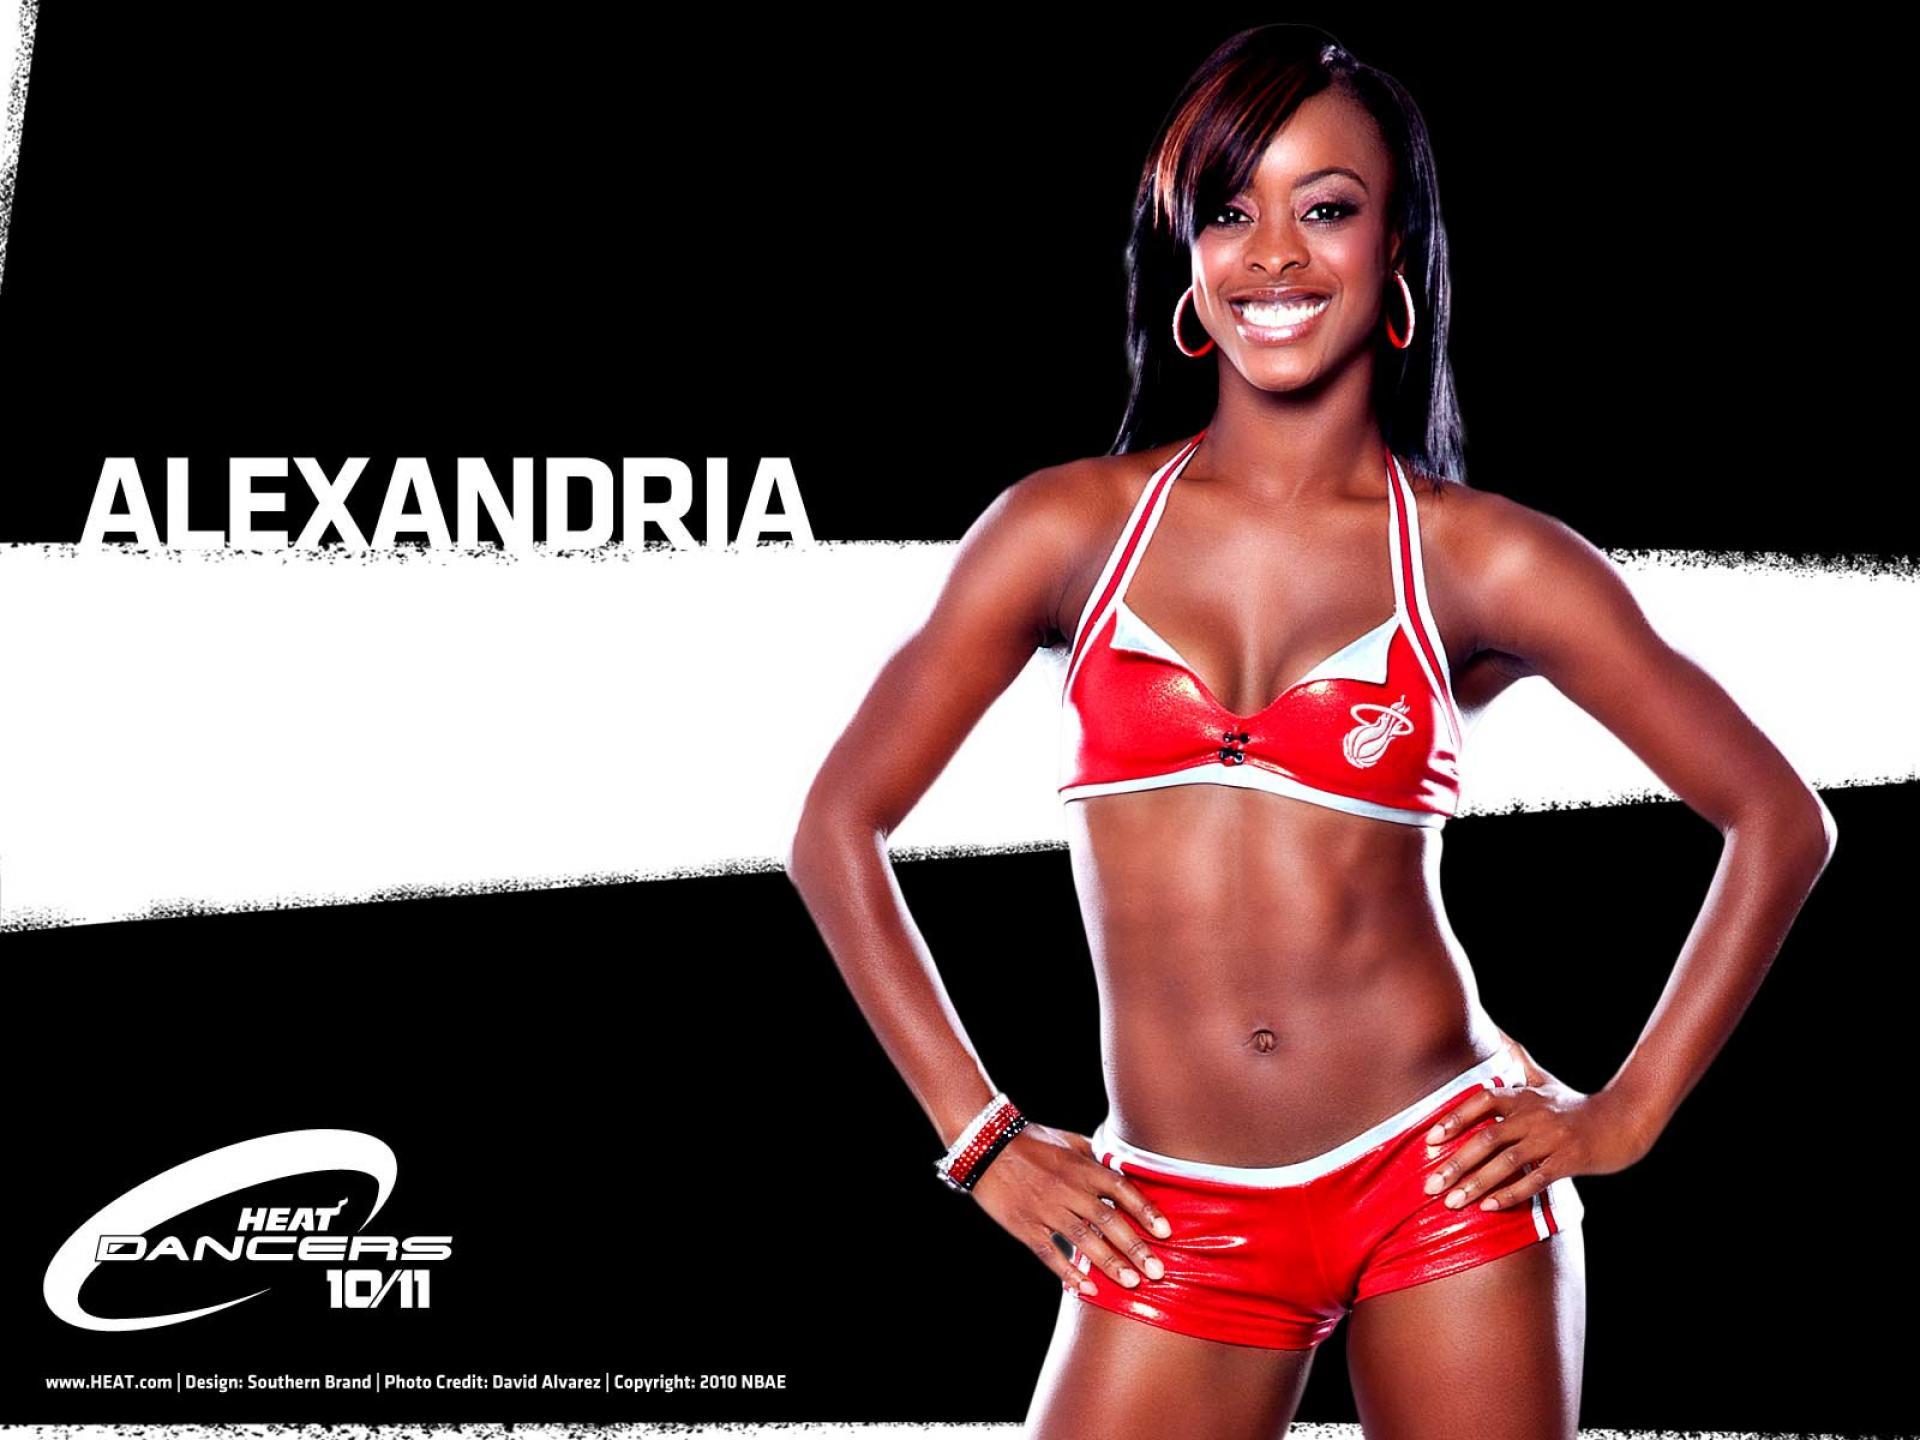 NBA Dancers   Miami Heat girls   alex   United States  USA Pictures HD Wallpaper